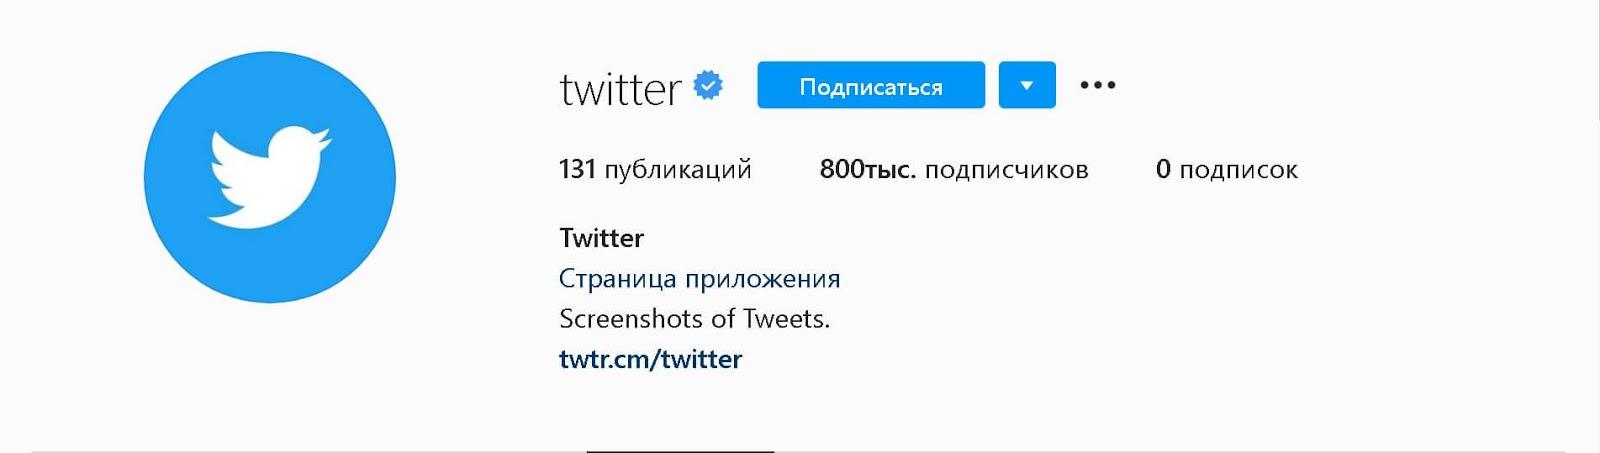 instagram-bios-twitter